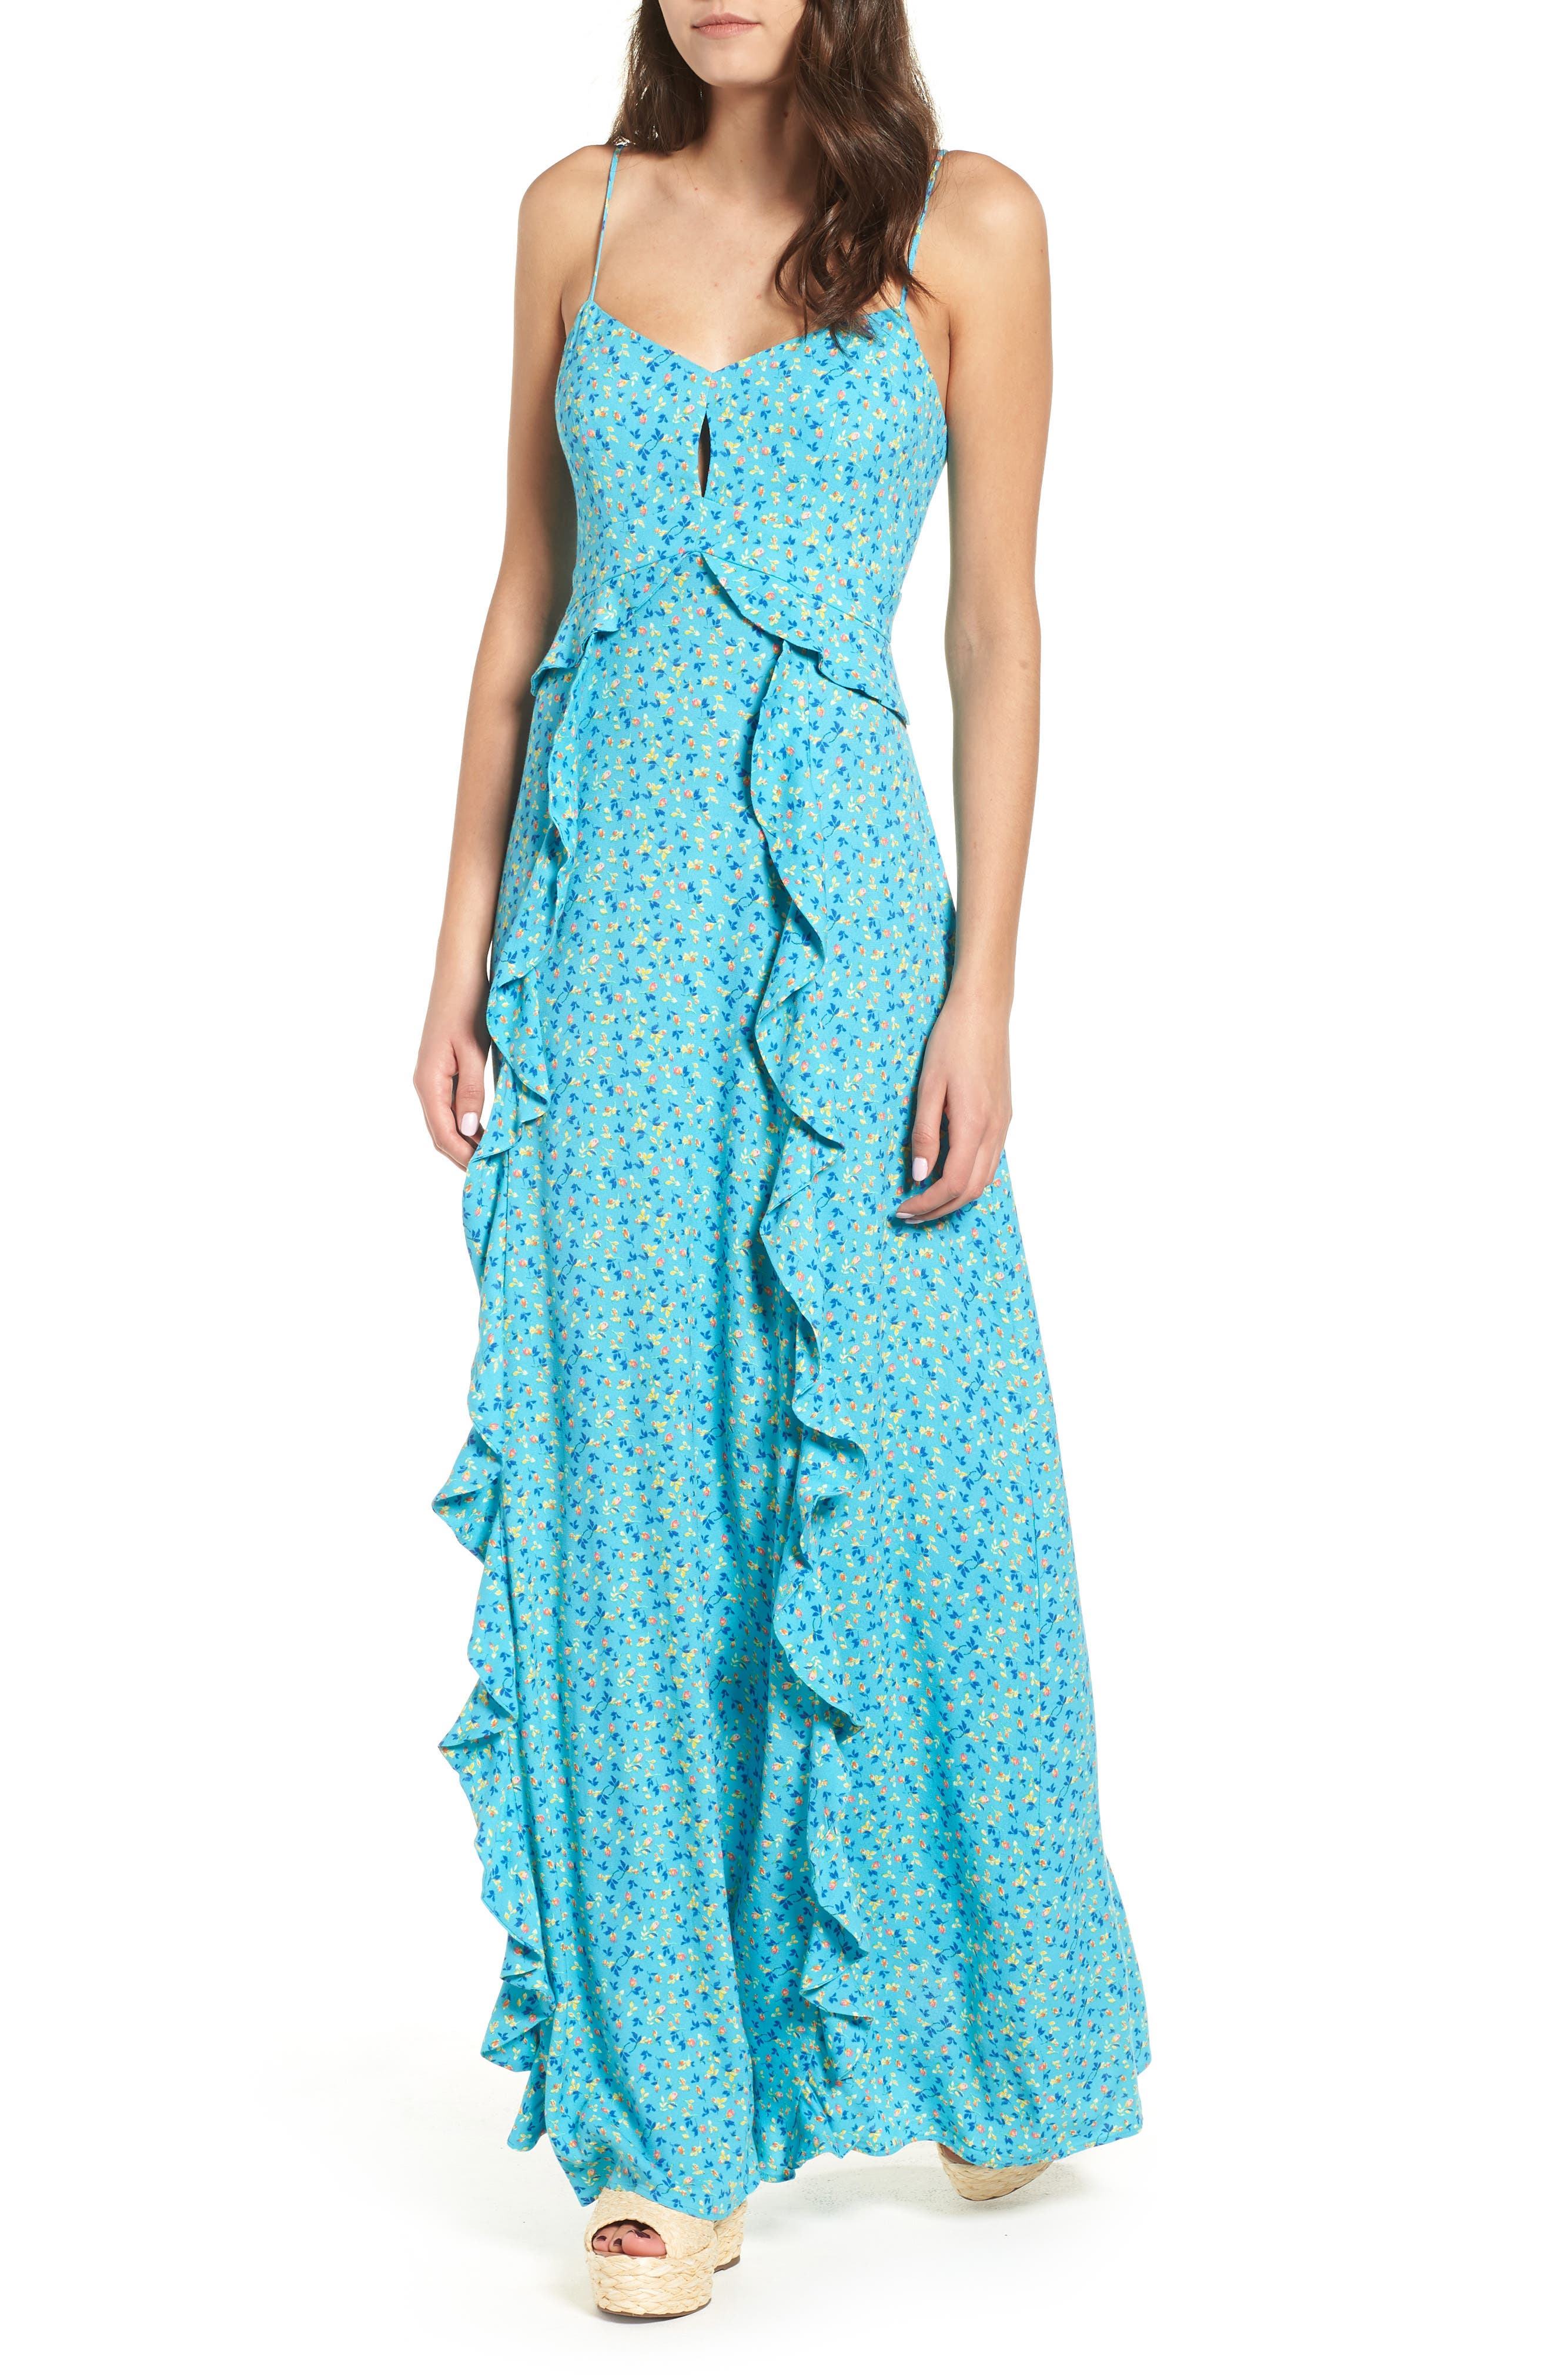 Kiki Ruffle Maxi Dress,                         Main,                         color, 400